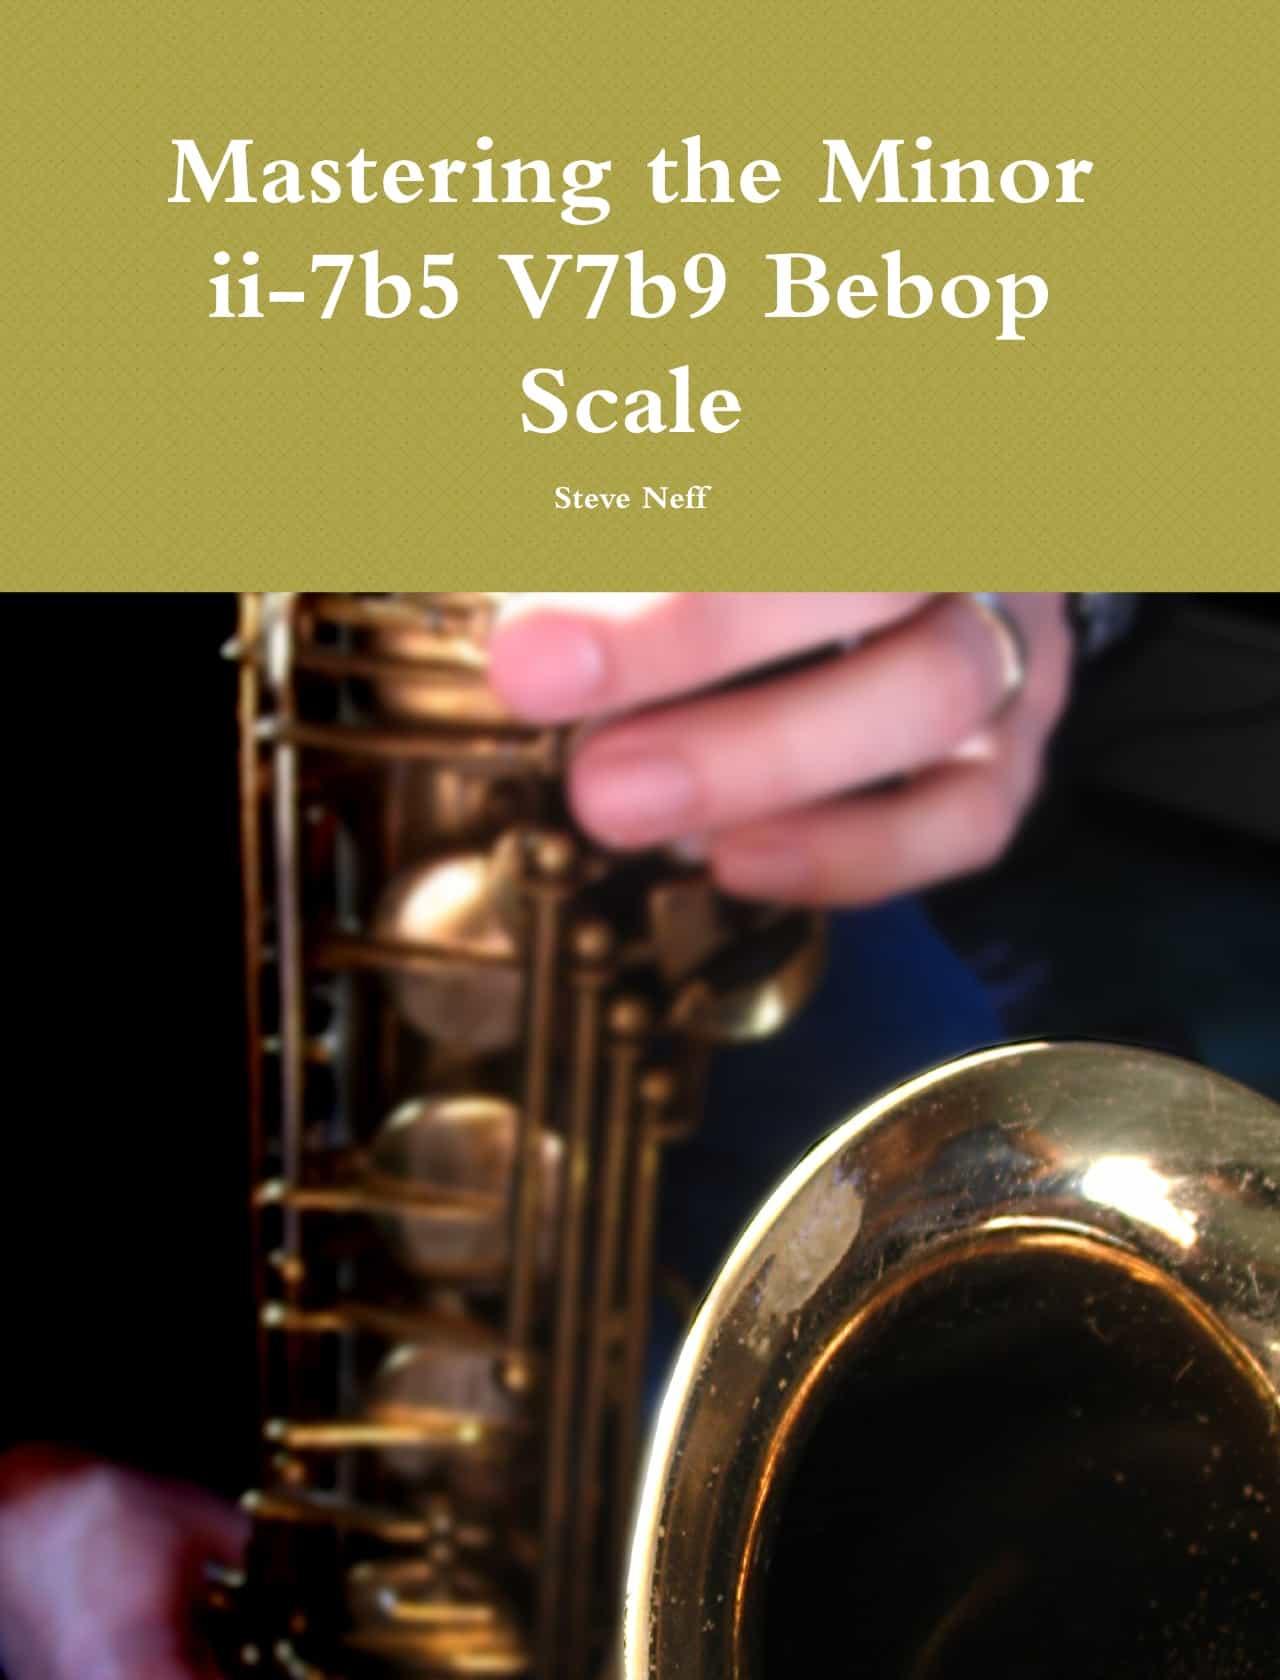 NEW Book-Mastering the Minor ii-7b5 V7b9 Bebop Scale